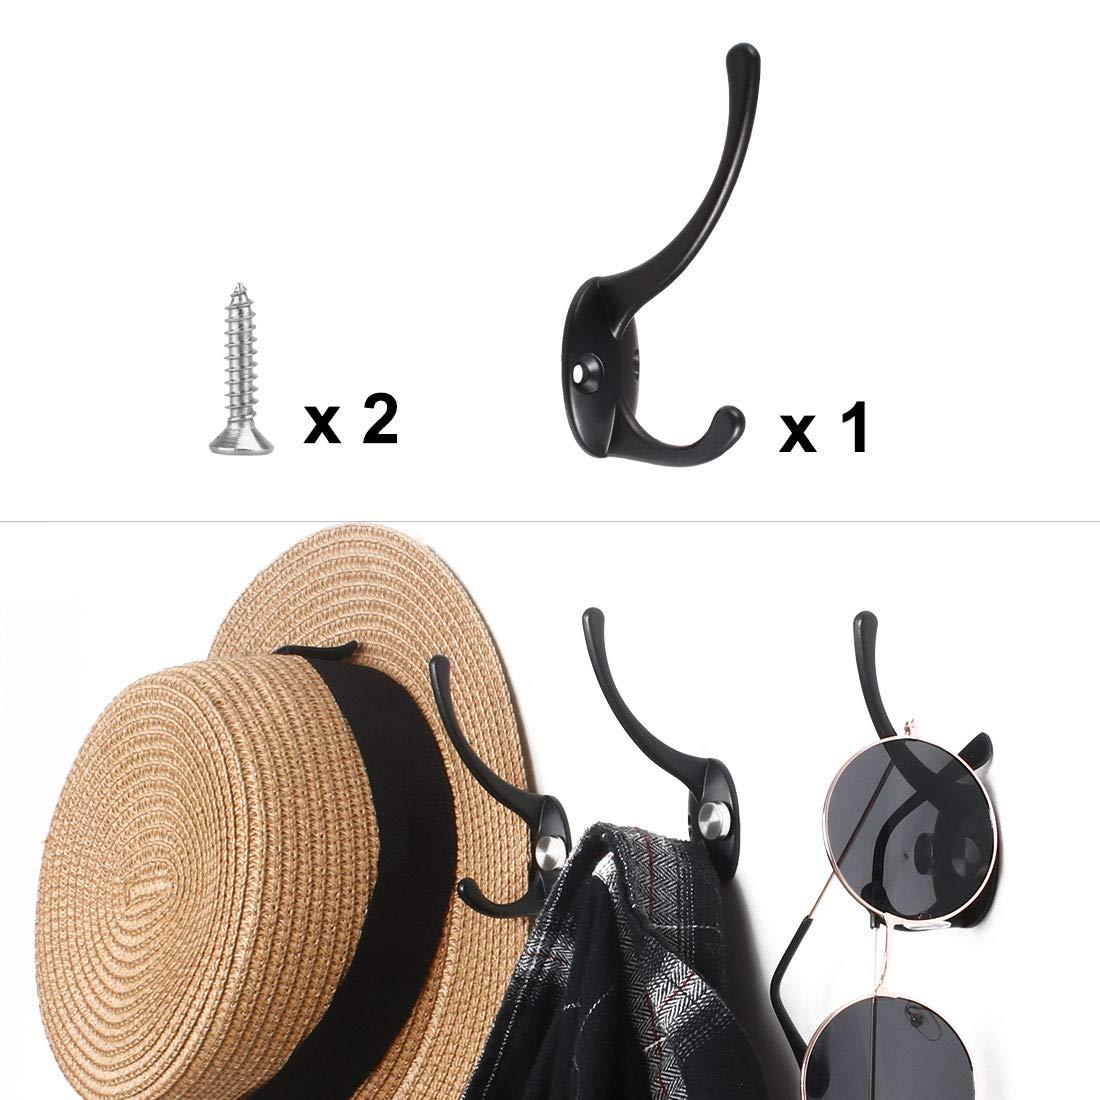 Black uxcell/® 6pcs Dual Robe Hook Stainless Steel Wall Mounted Hooks Coat Towel Wall Clasp Bathroom Hanger w Screws